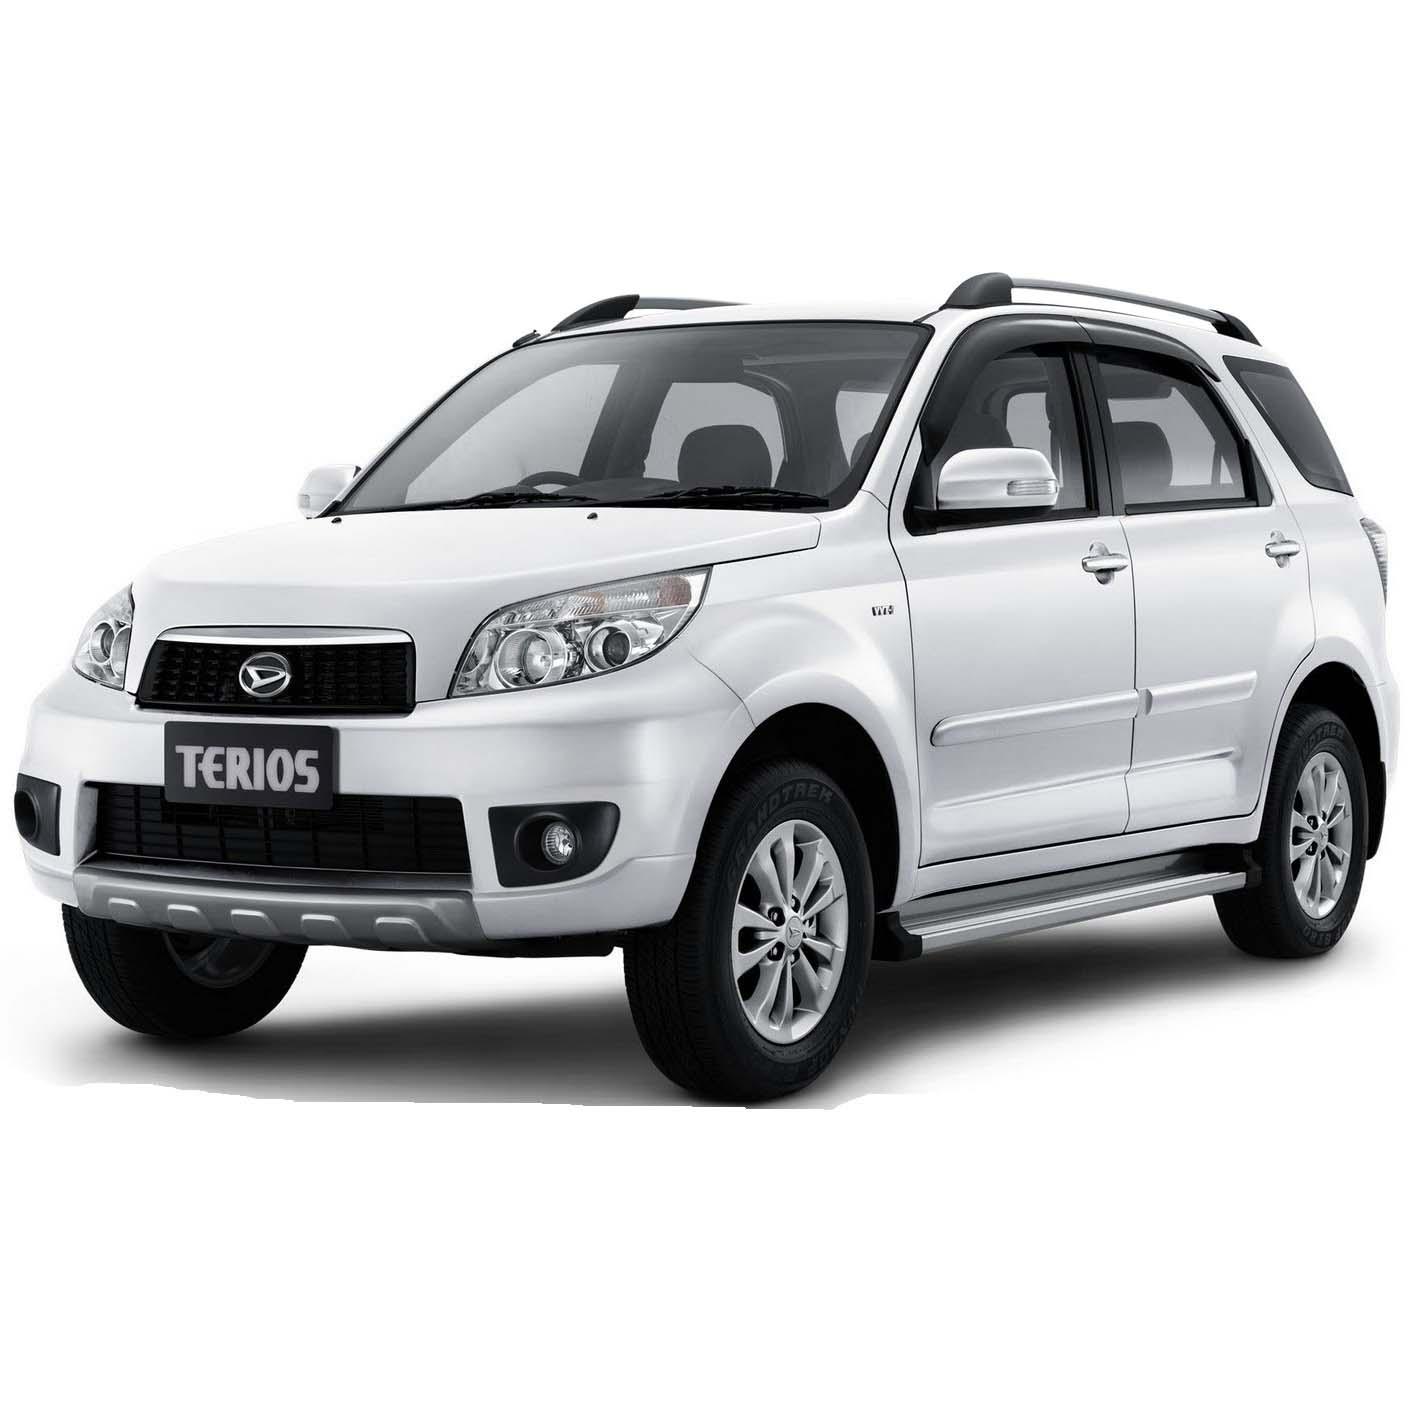 Daihatsu Terios 1997-2005